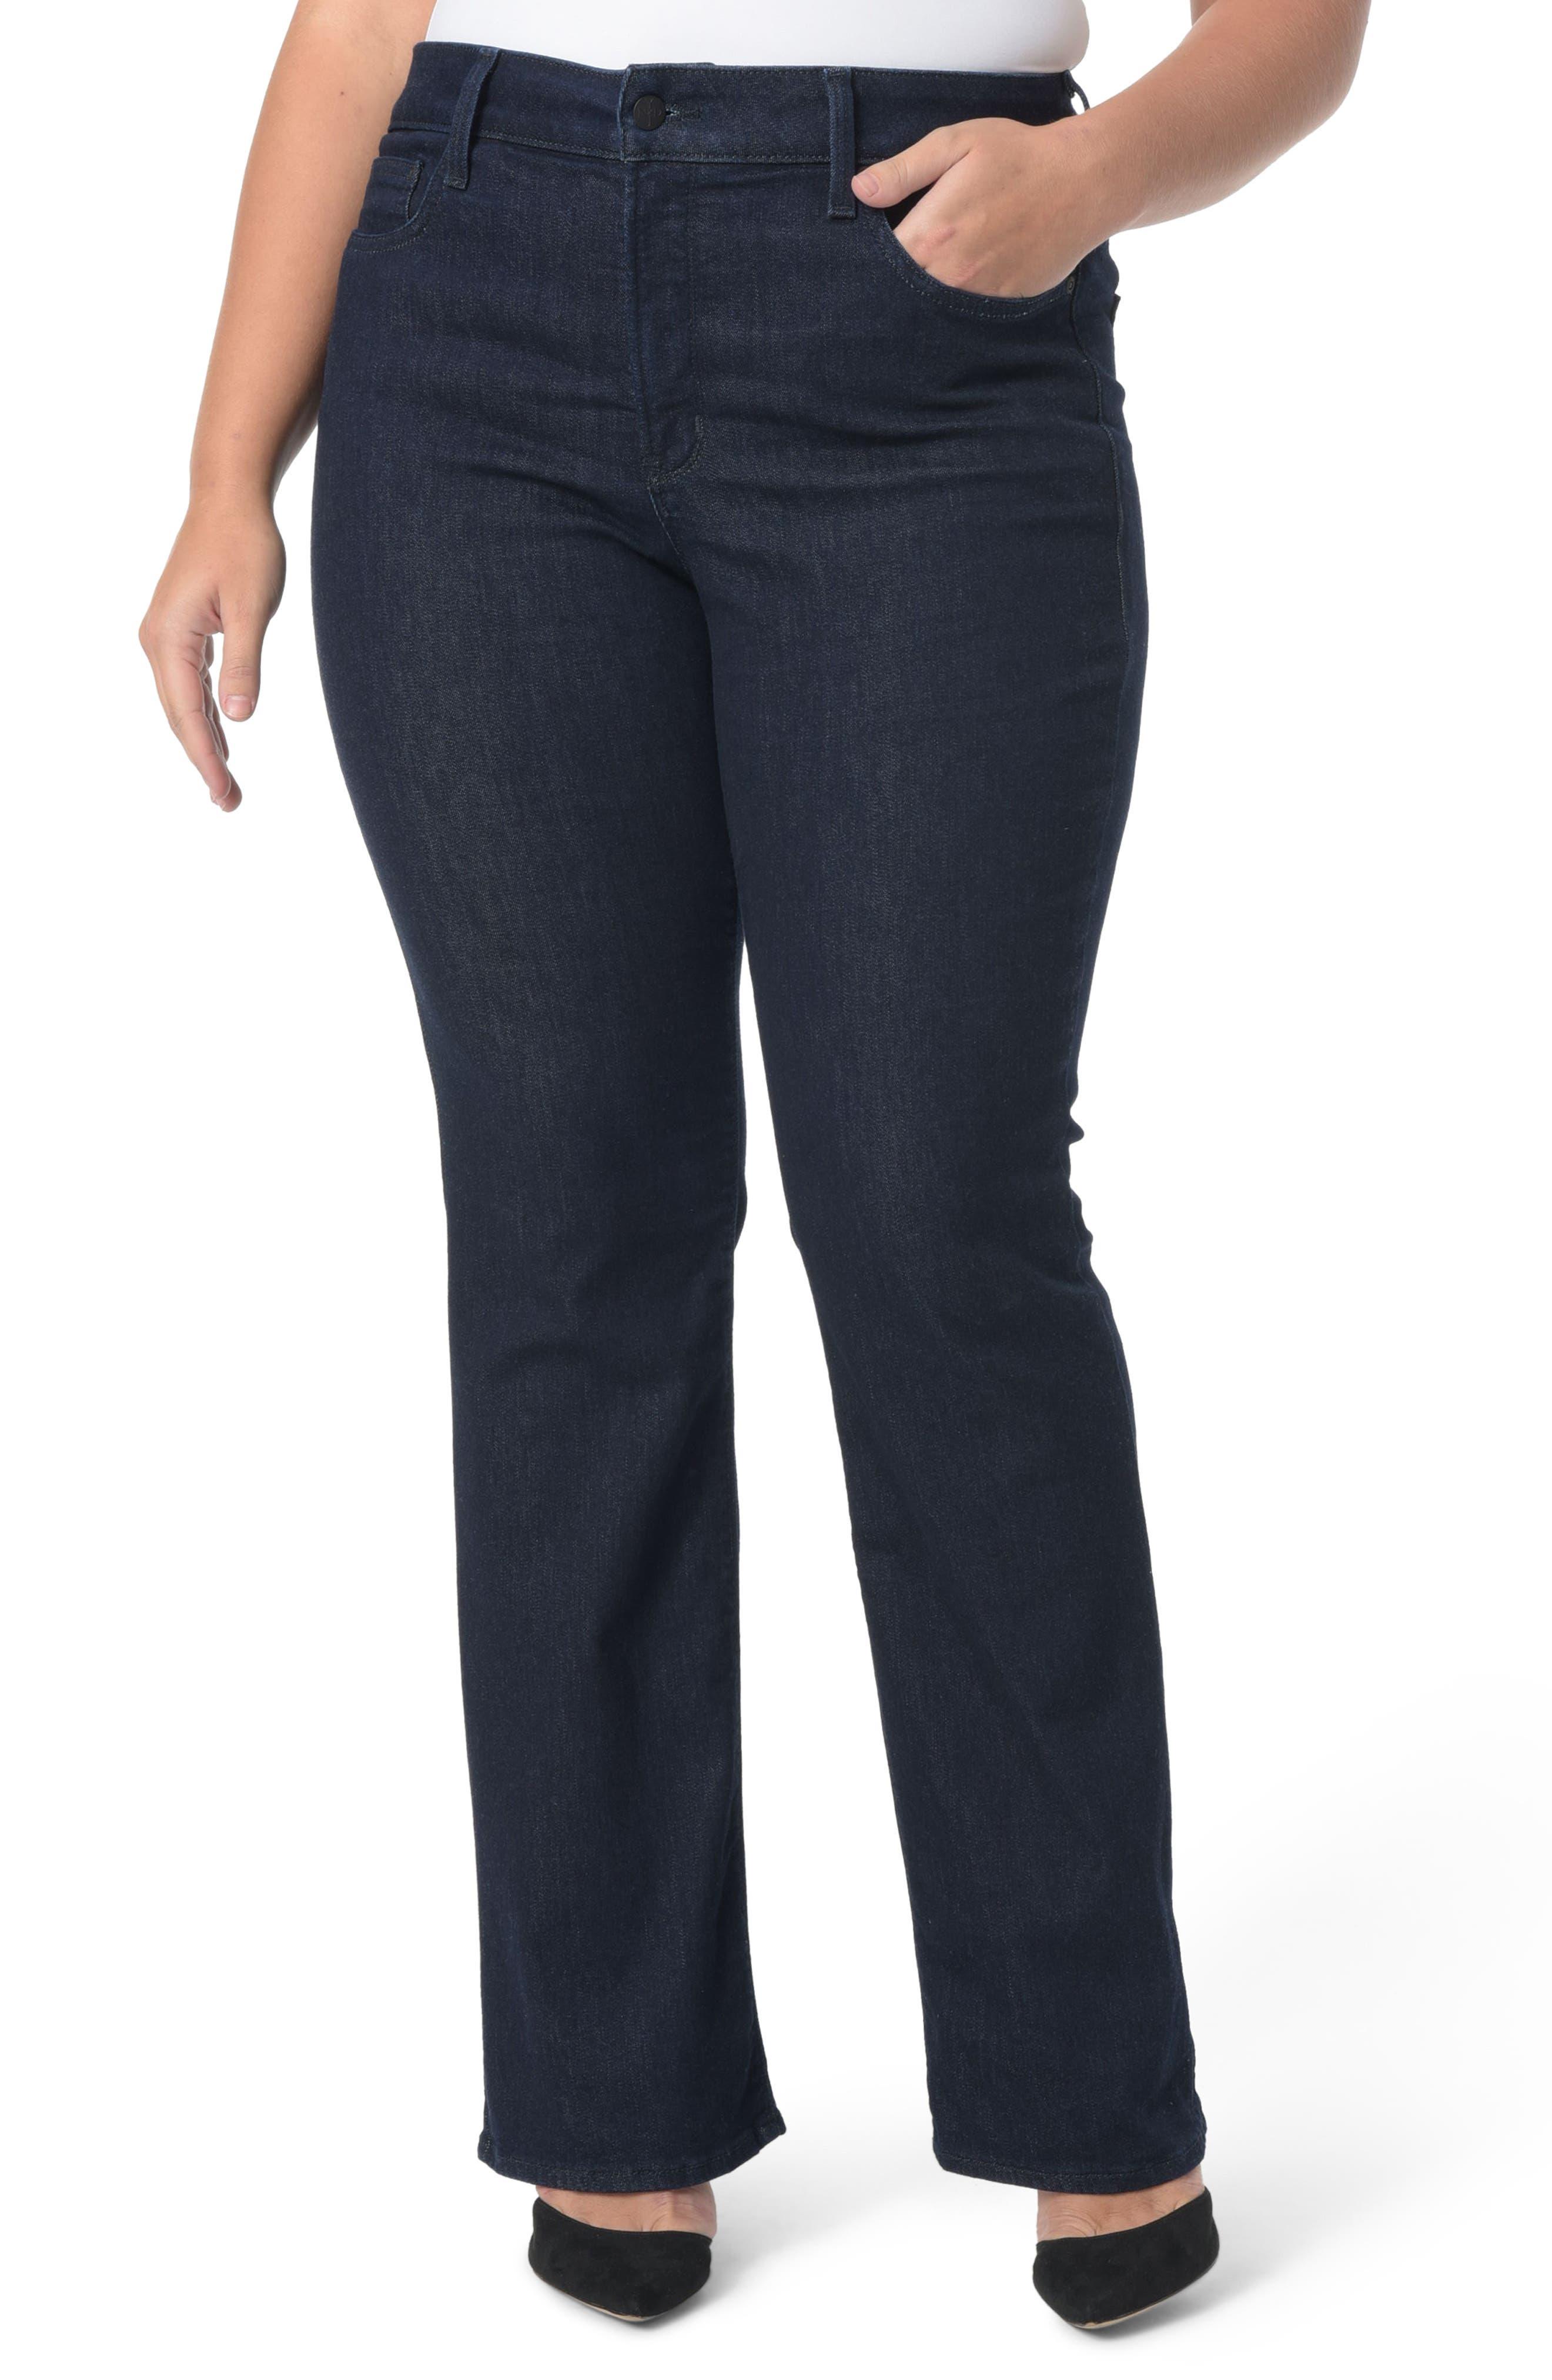 Plus Women's NYDJ Barbara Stretch Bootcut Jeans